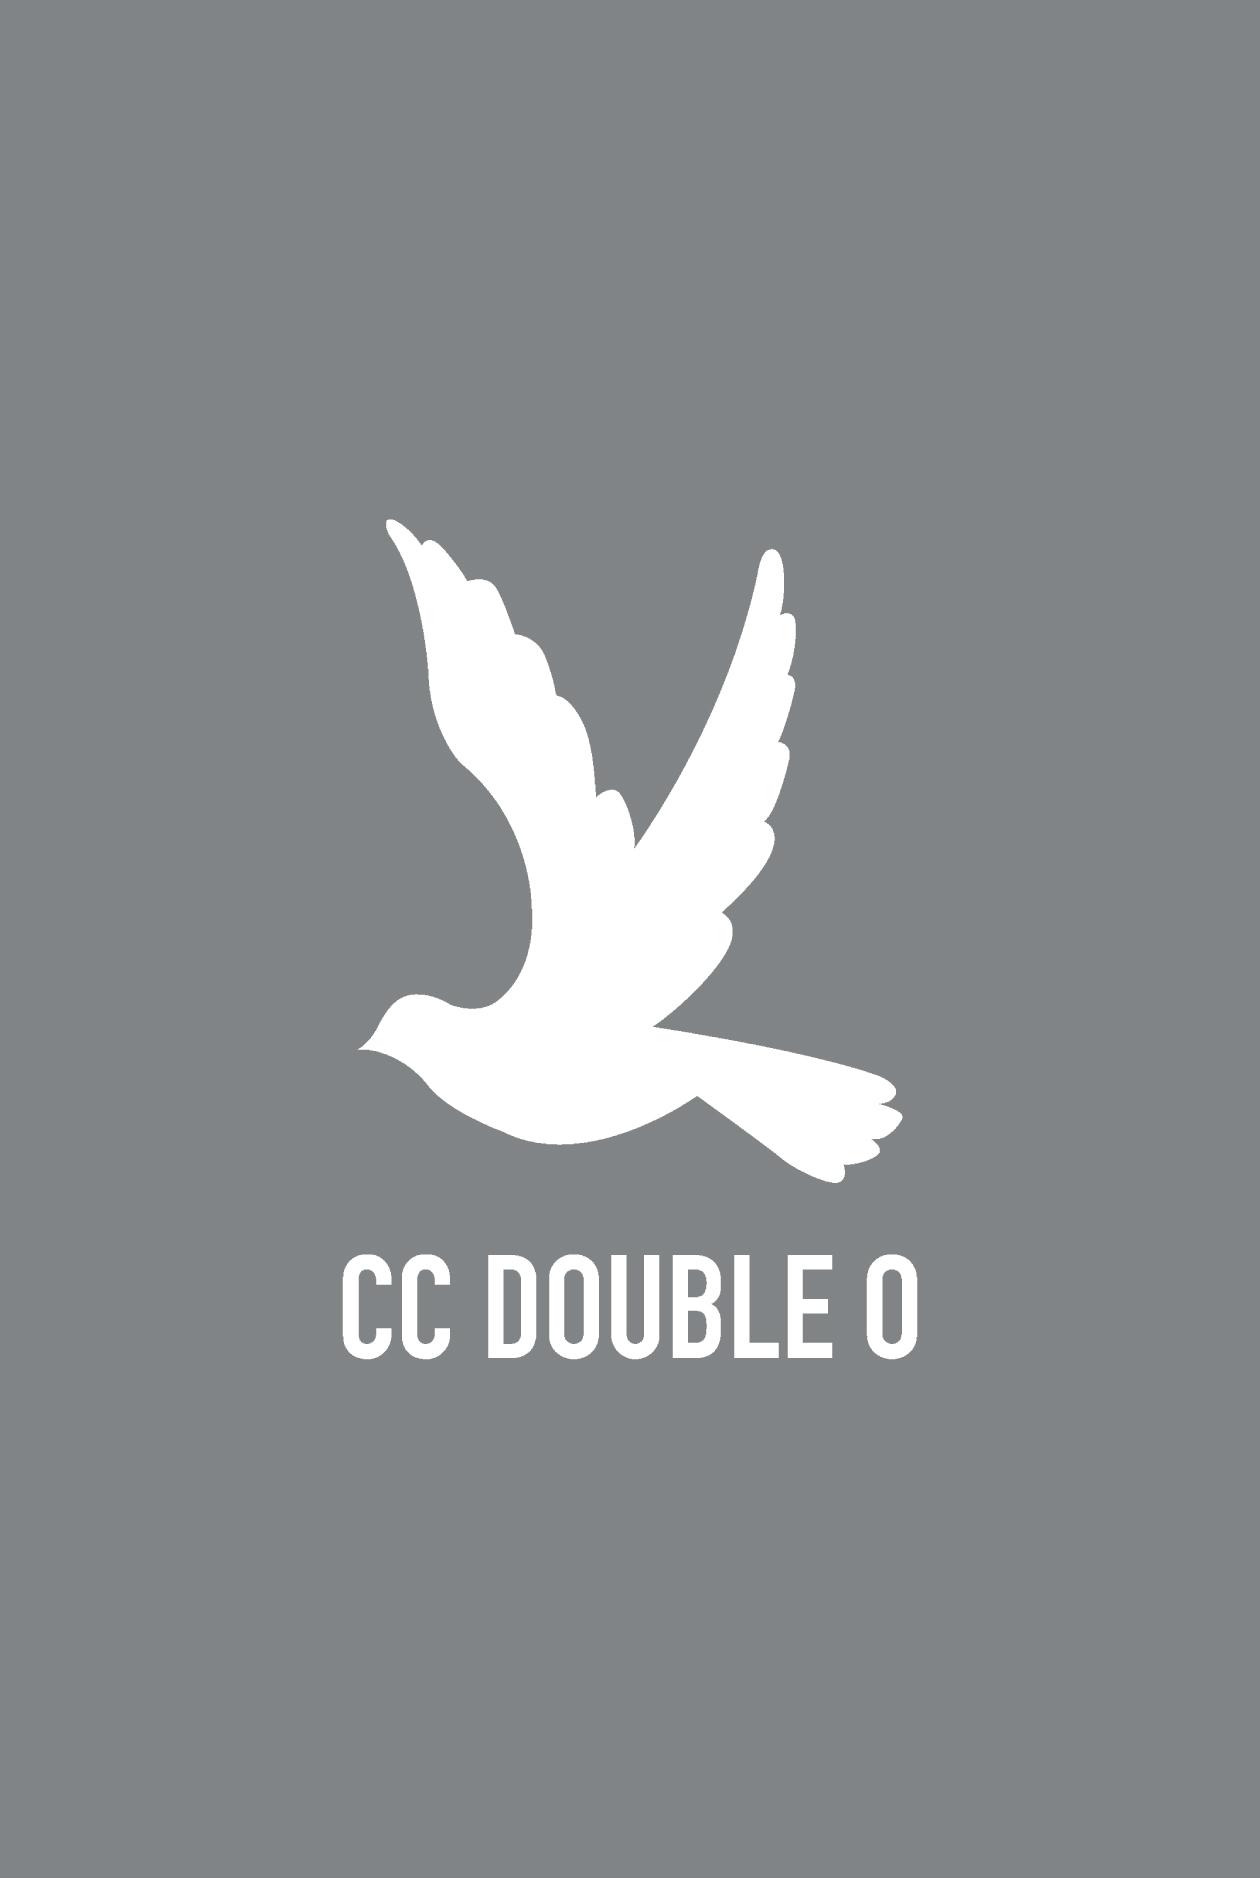 CC DOUBLE O Badge iPhone 6 Case